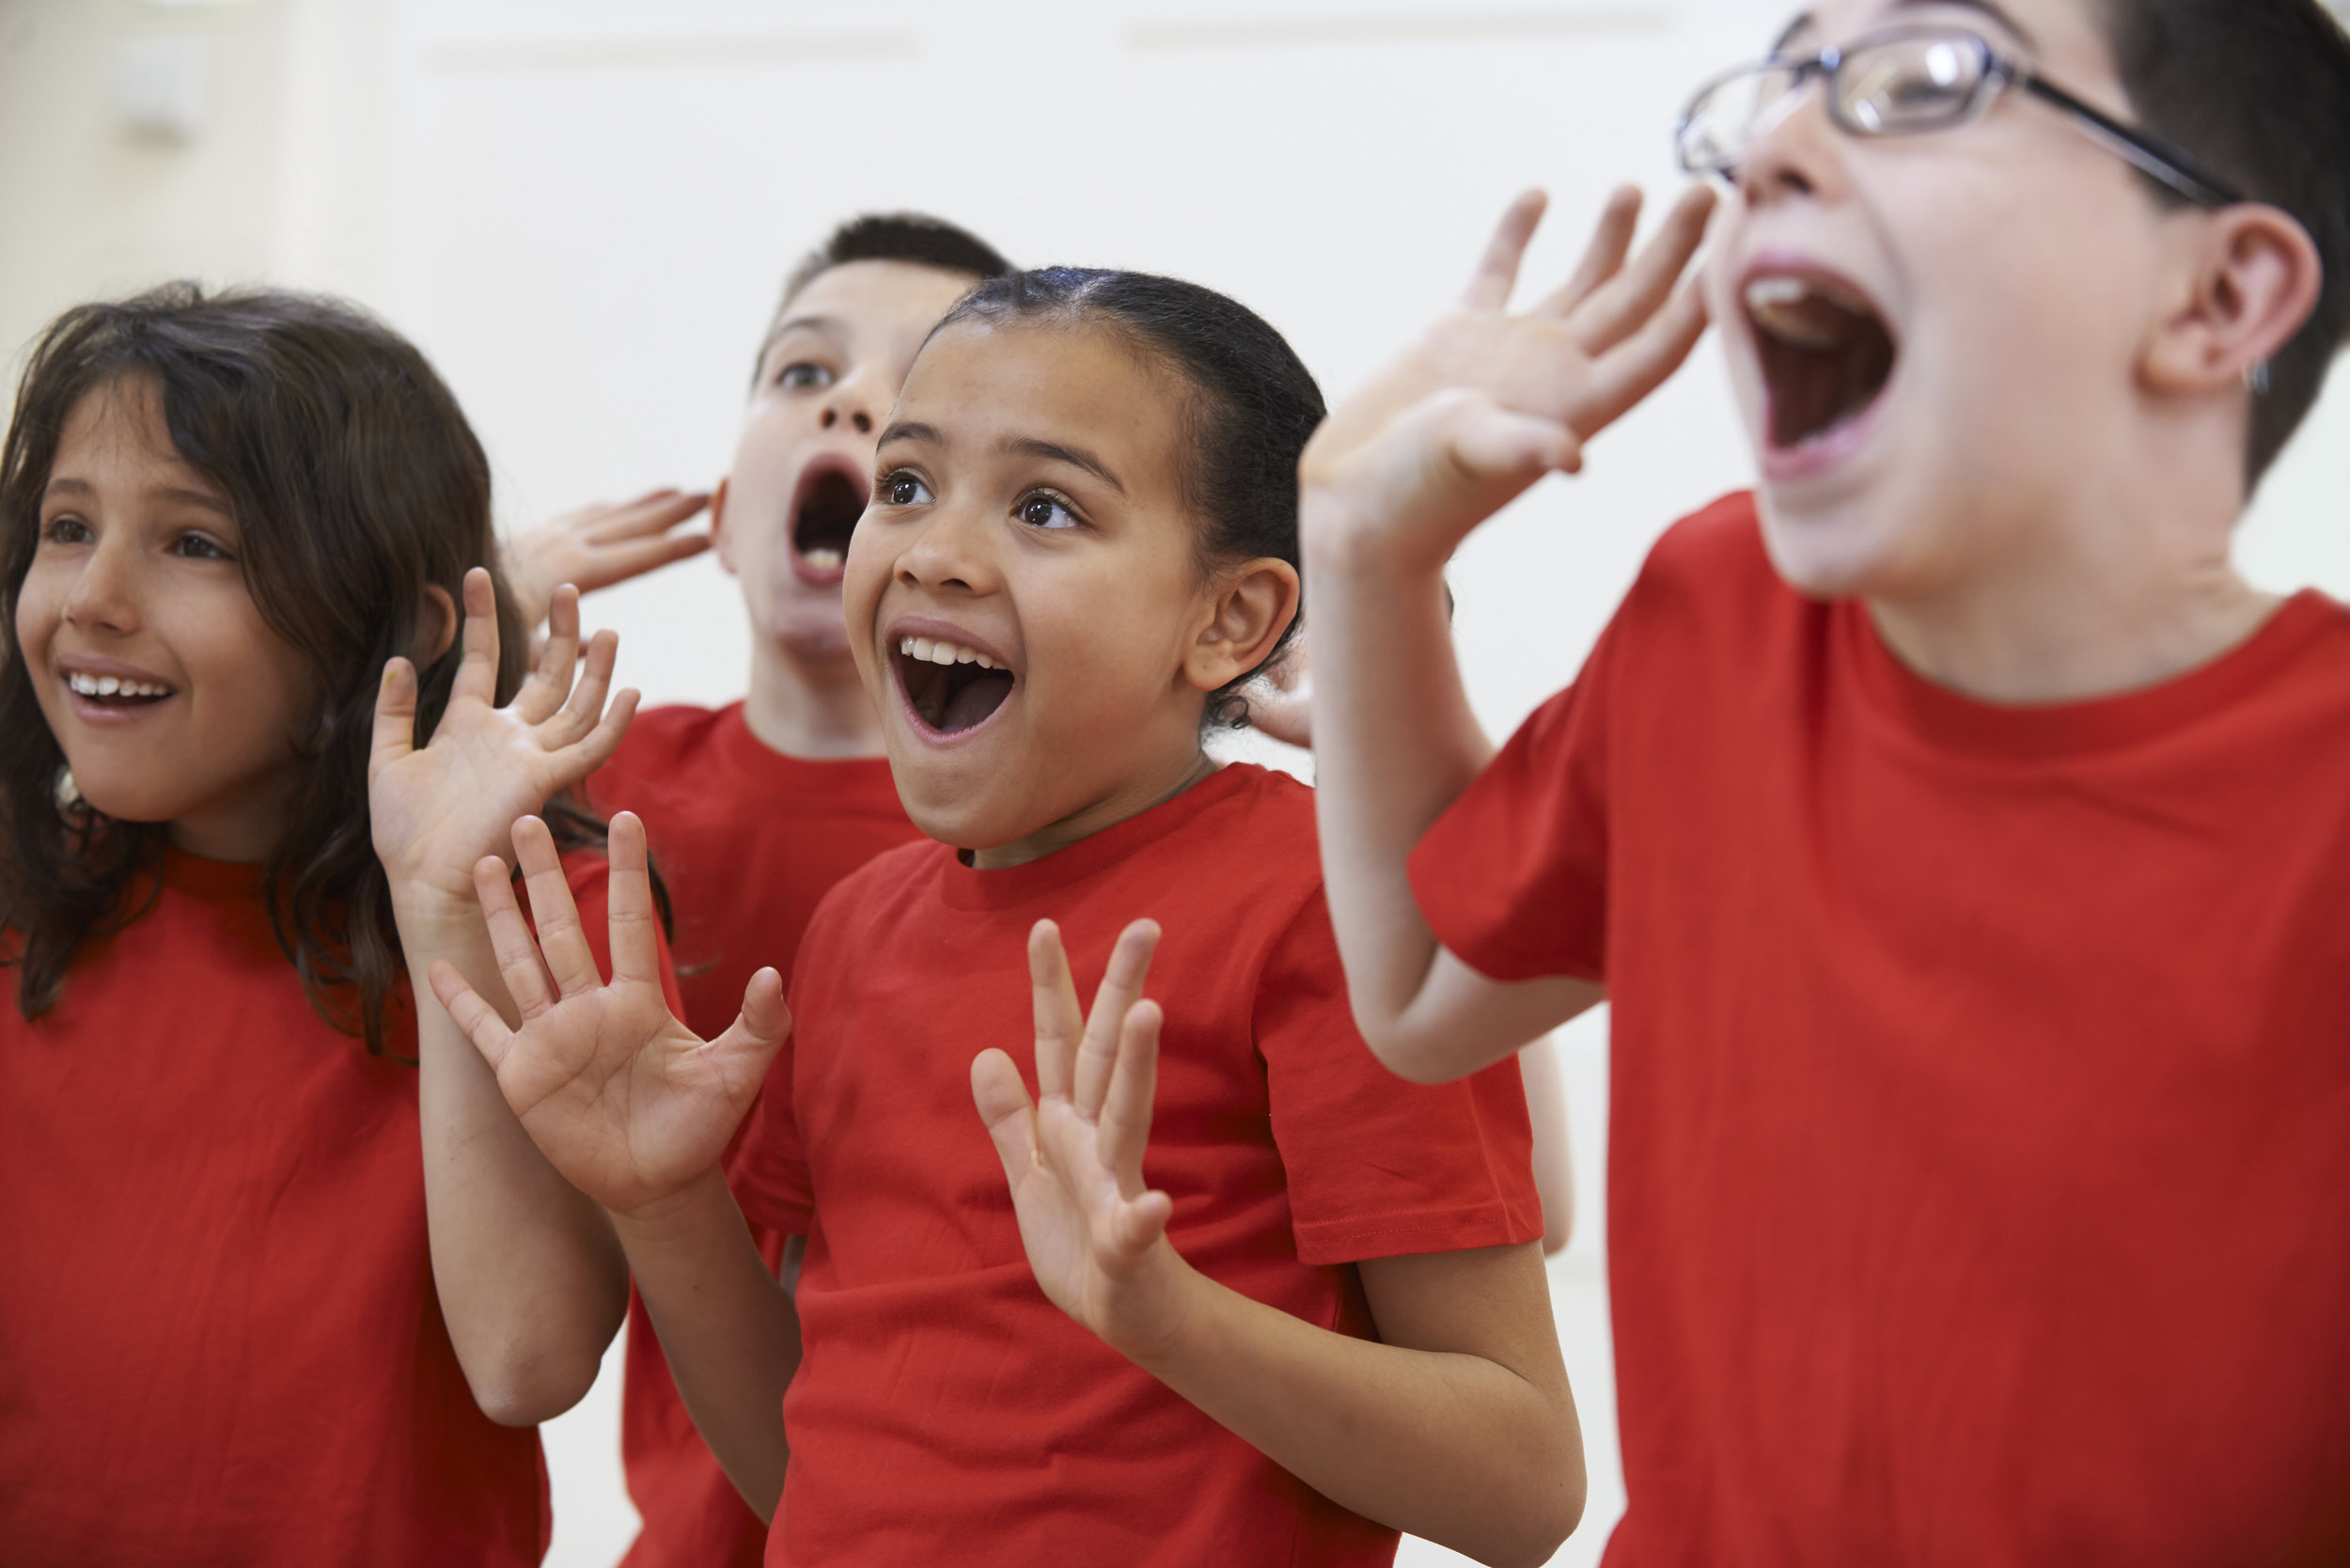 Smiling girl spreads hands performing poetry.jpg